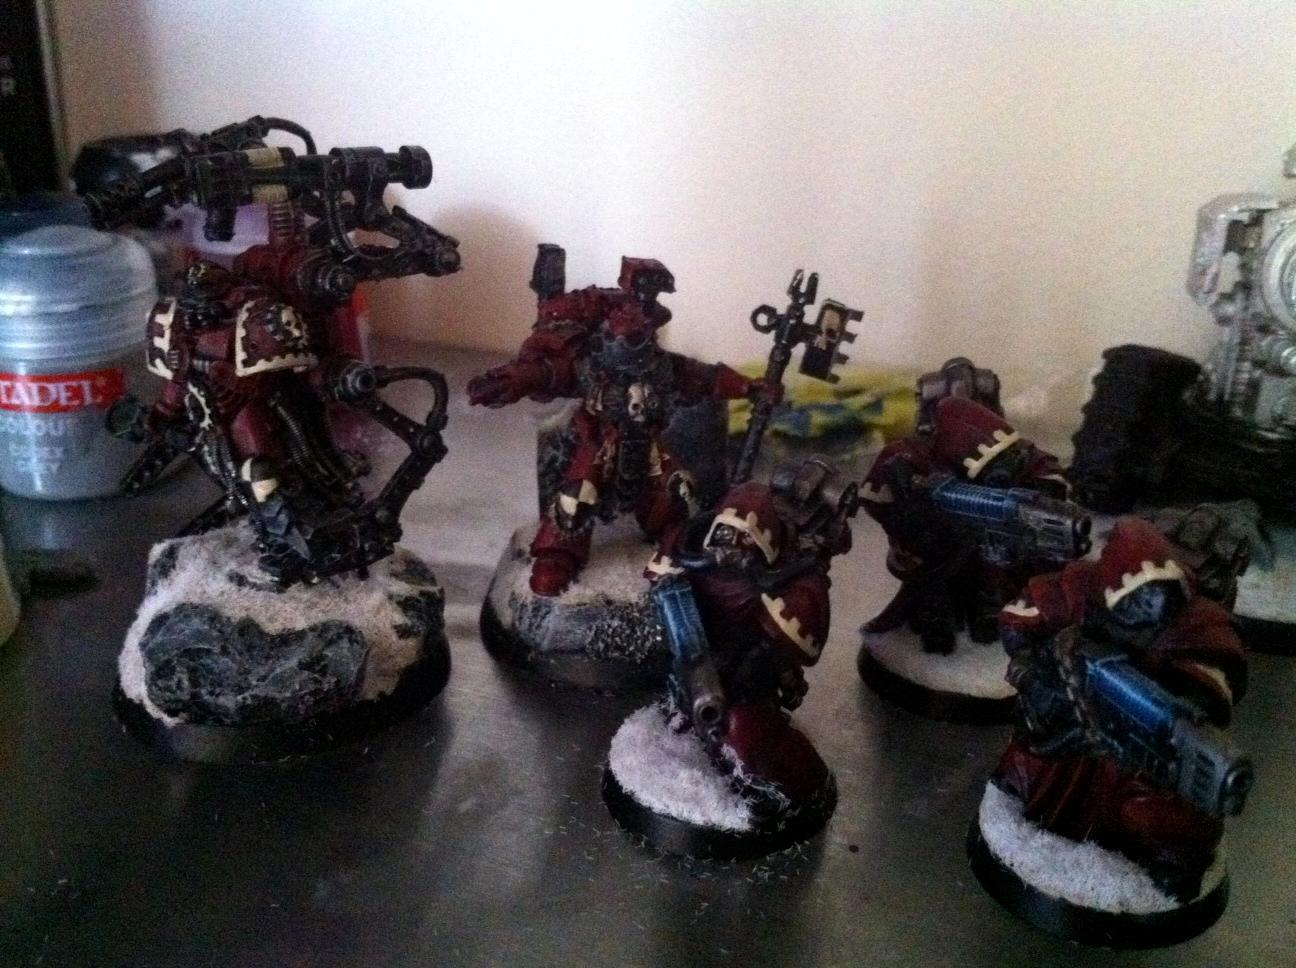 Adeptus Mechanicus, Am, Magos, Mars, Mech, Skitarii, Titan